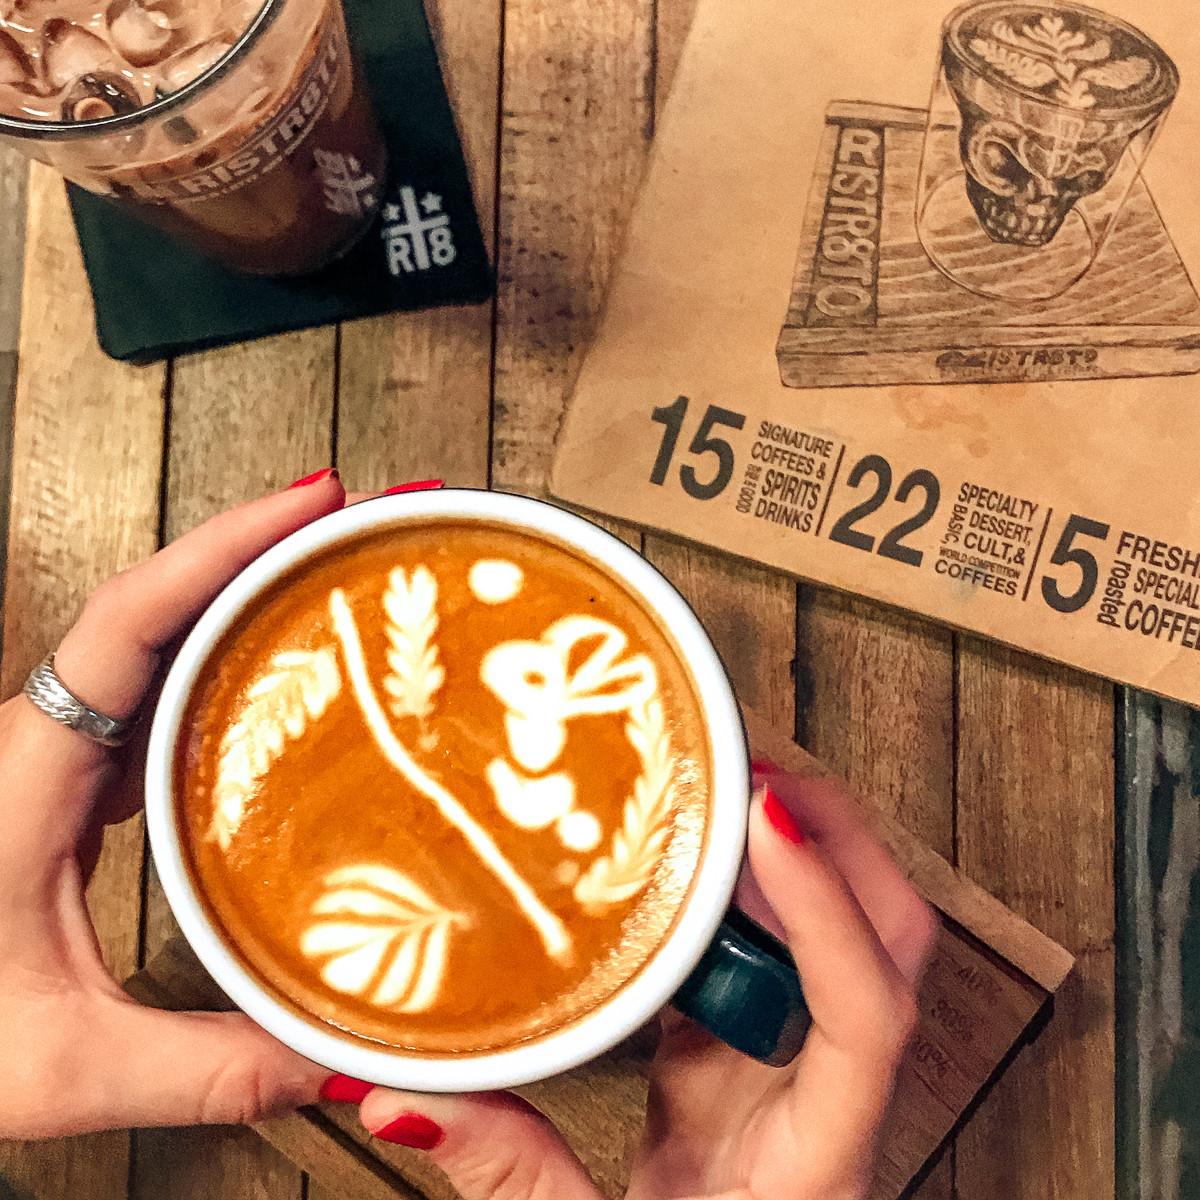 Ristr8to Lab latte art